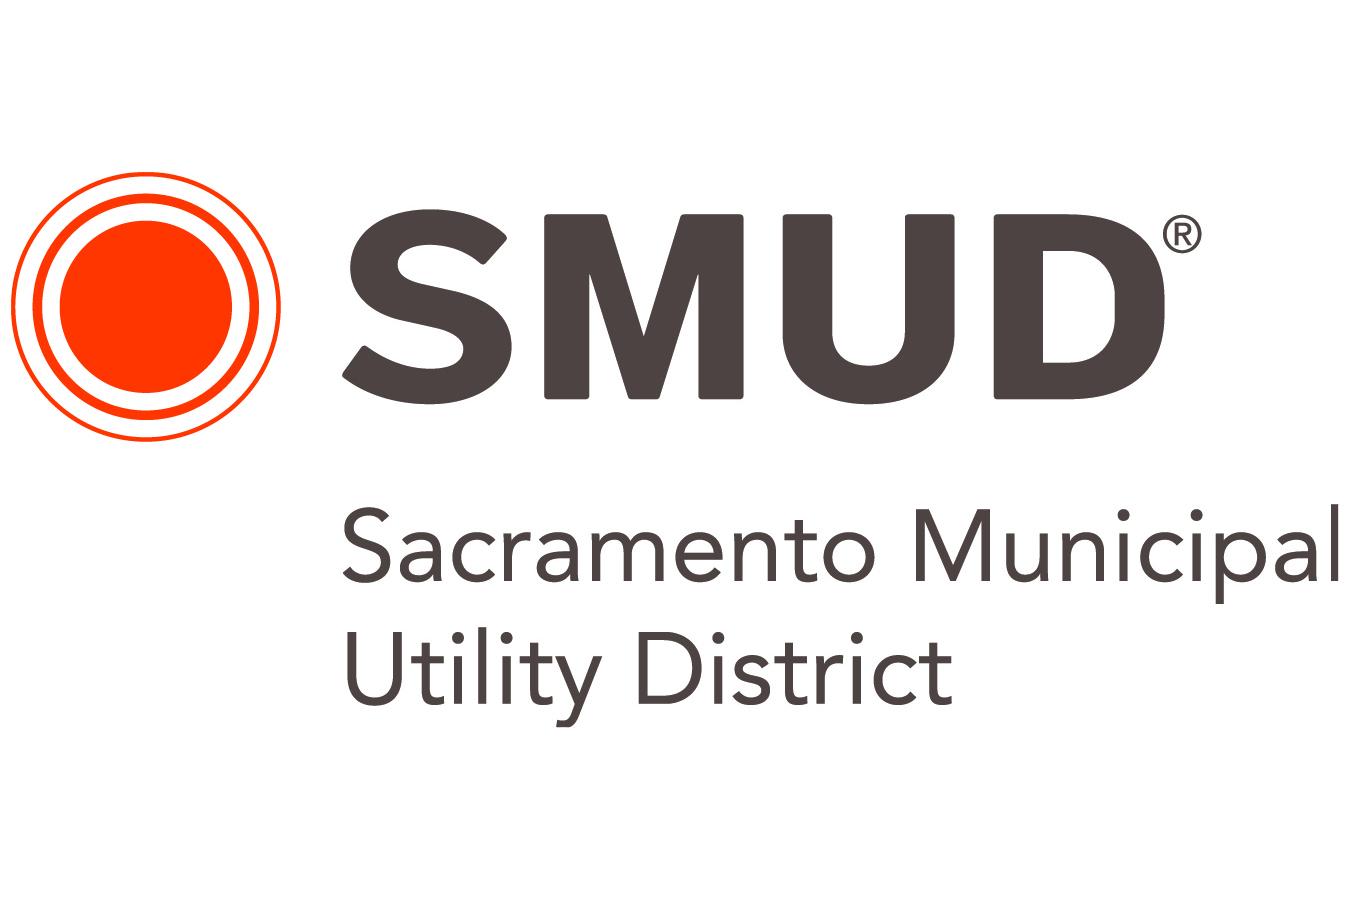 Sacramento Municipal Utility District - SMUD